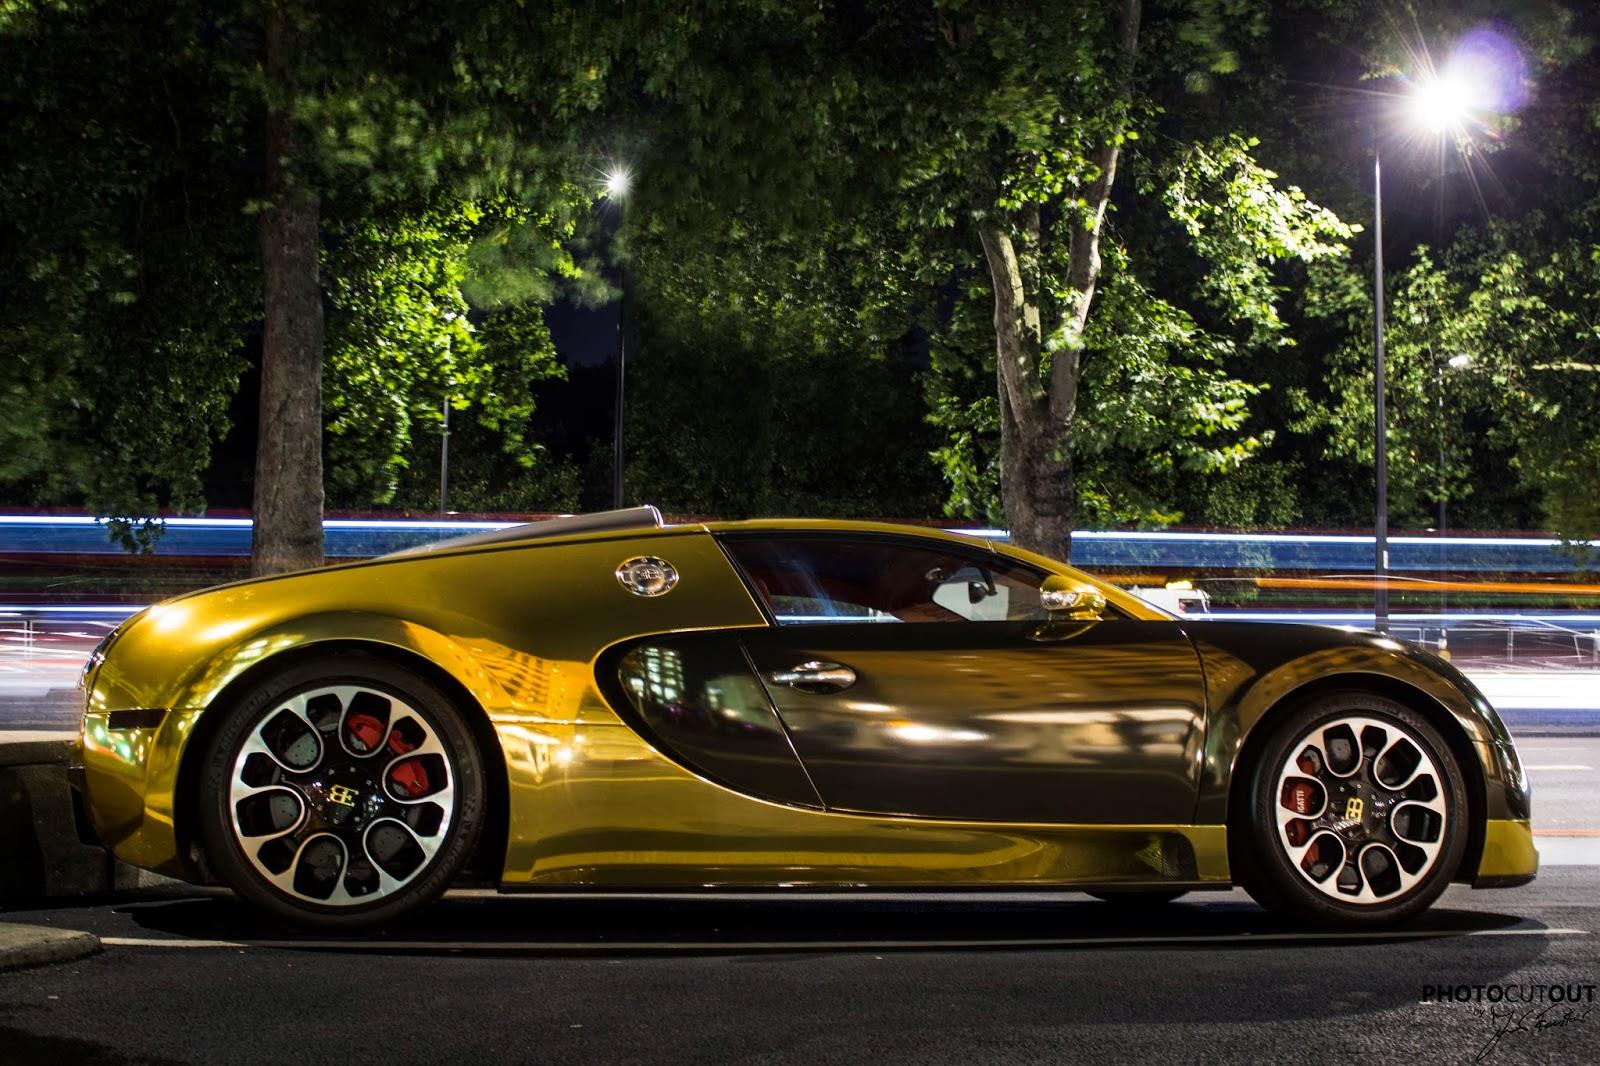 88+ Gold Cars Wallpapers on WallpaperSafari